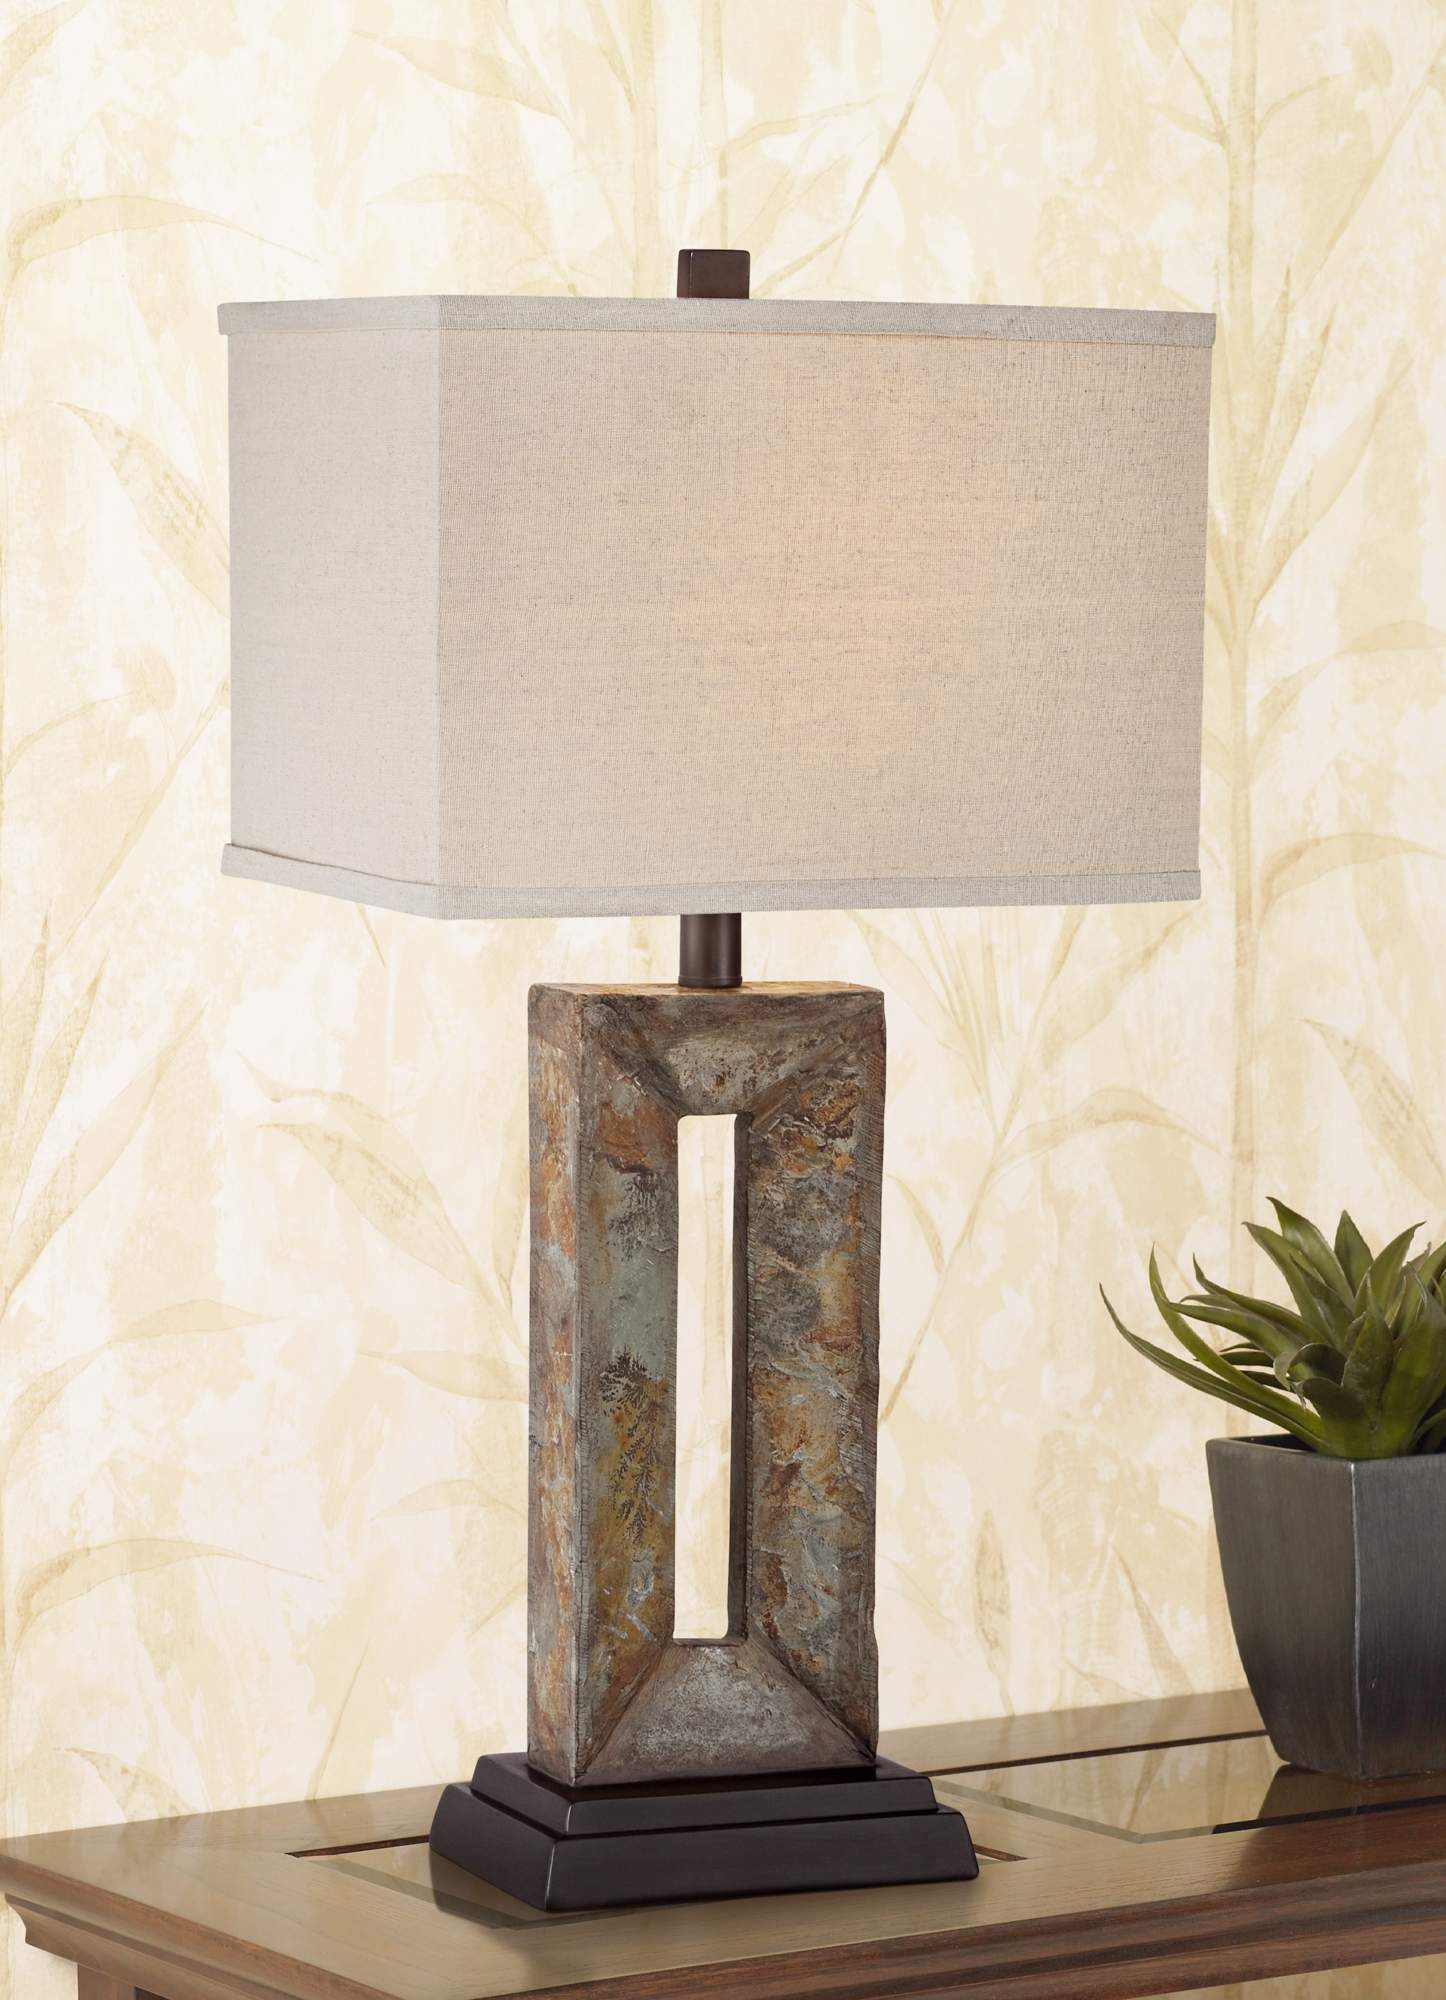 Tahoe Small Rectangular Slate Table Lamp 5y311 Lamps Plus Rustic Table Lamps Slate Table Lamp Small Table Lamp